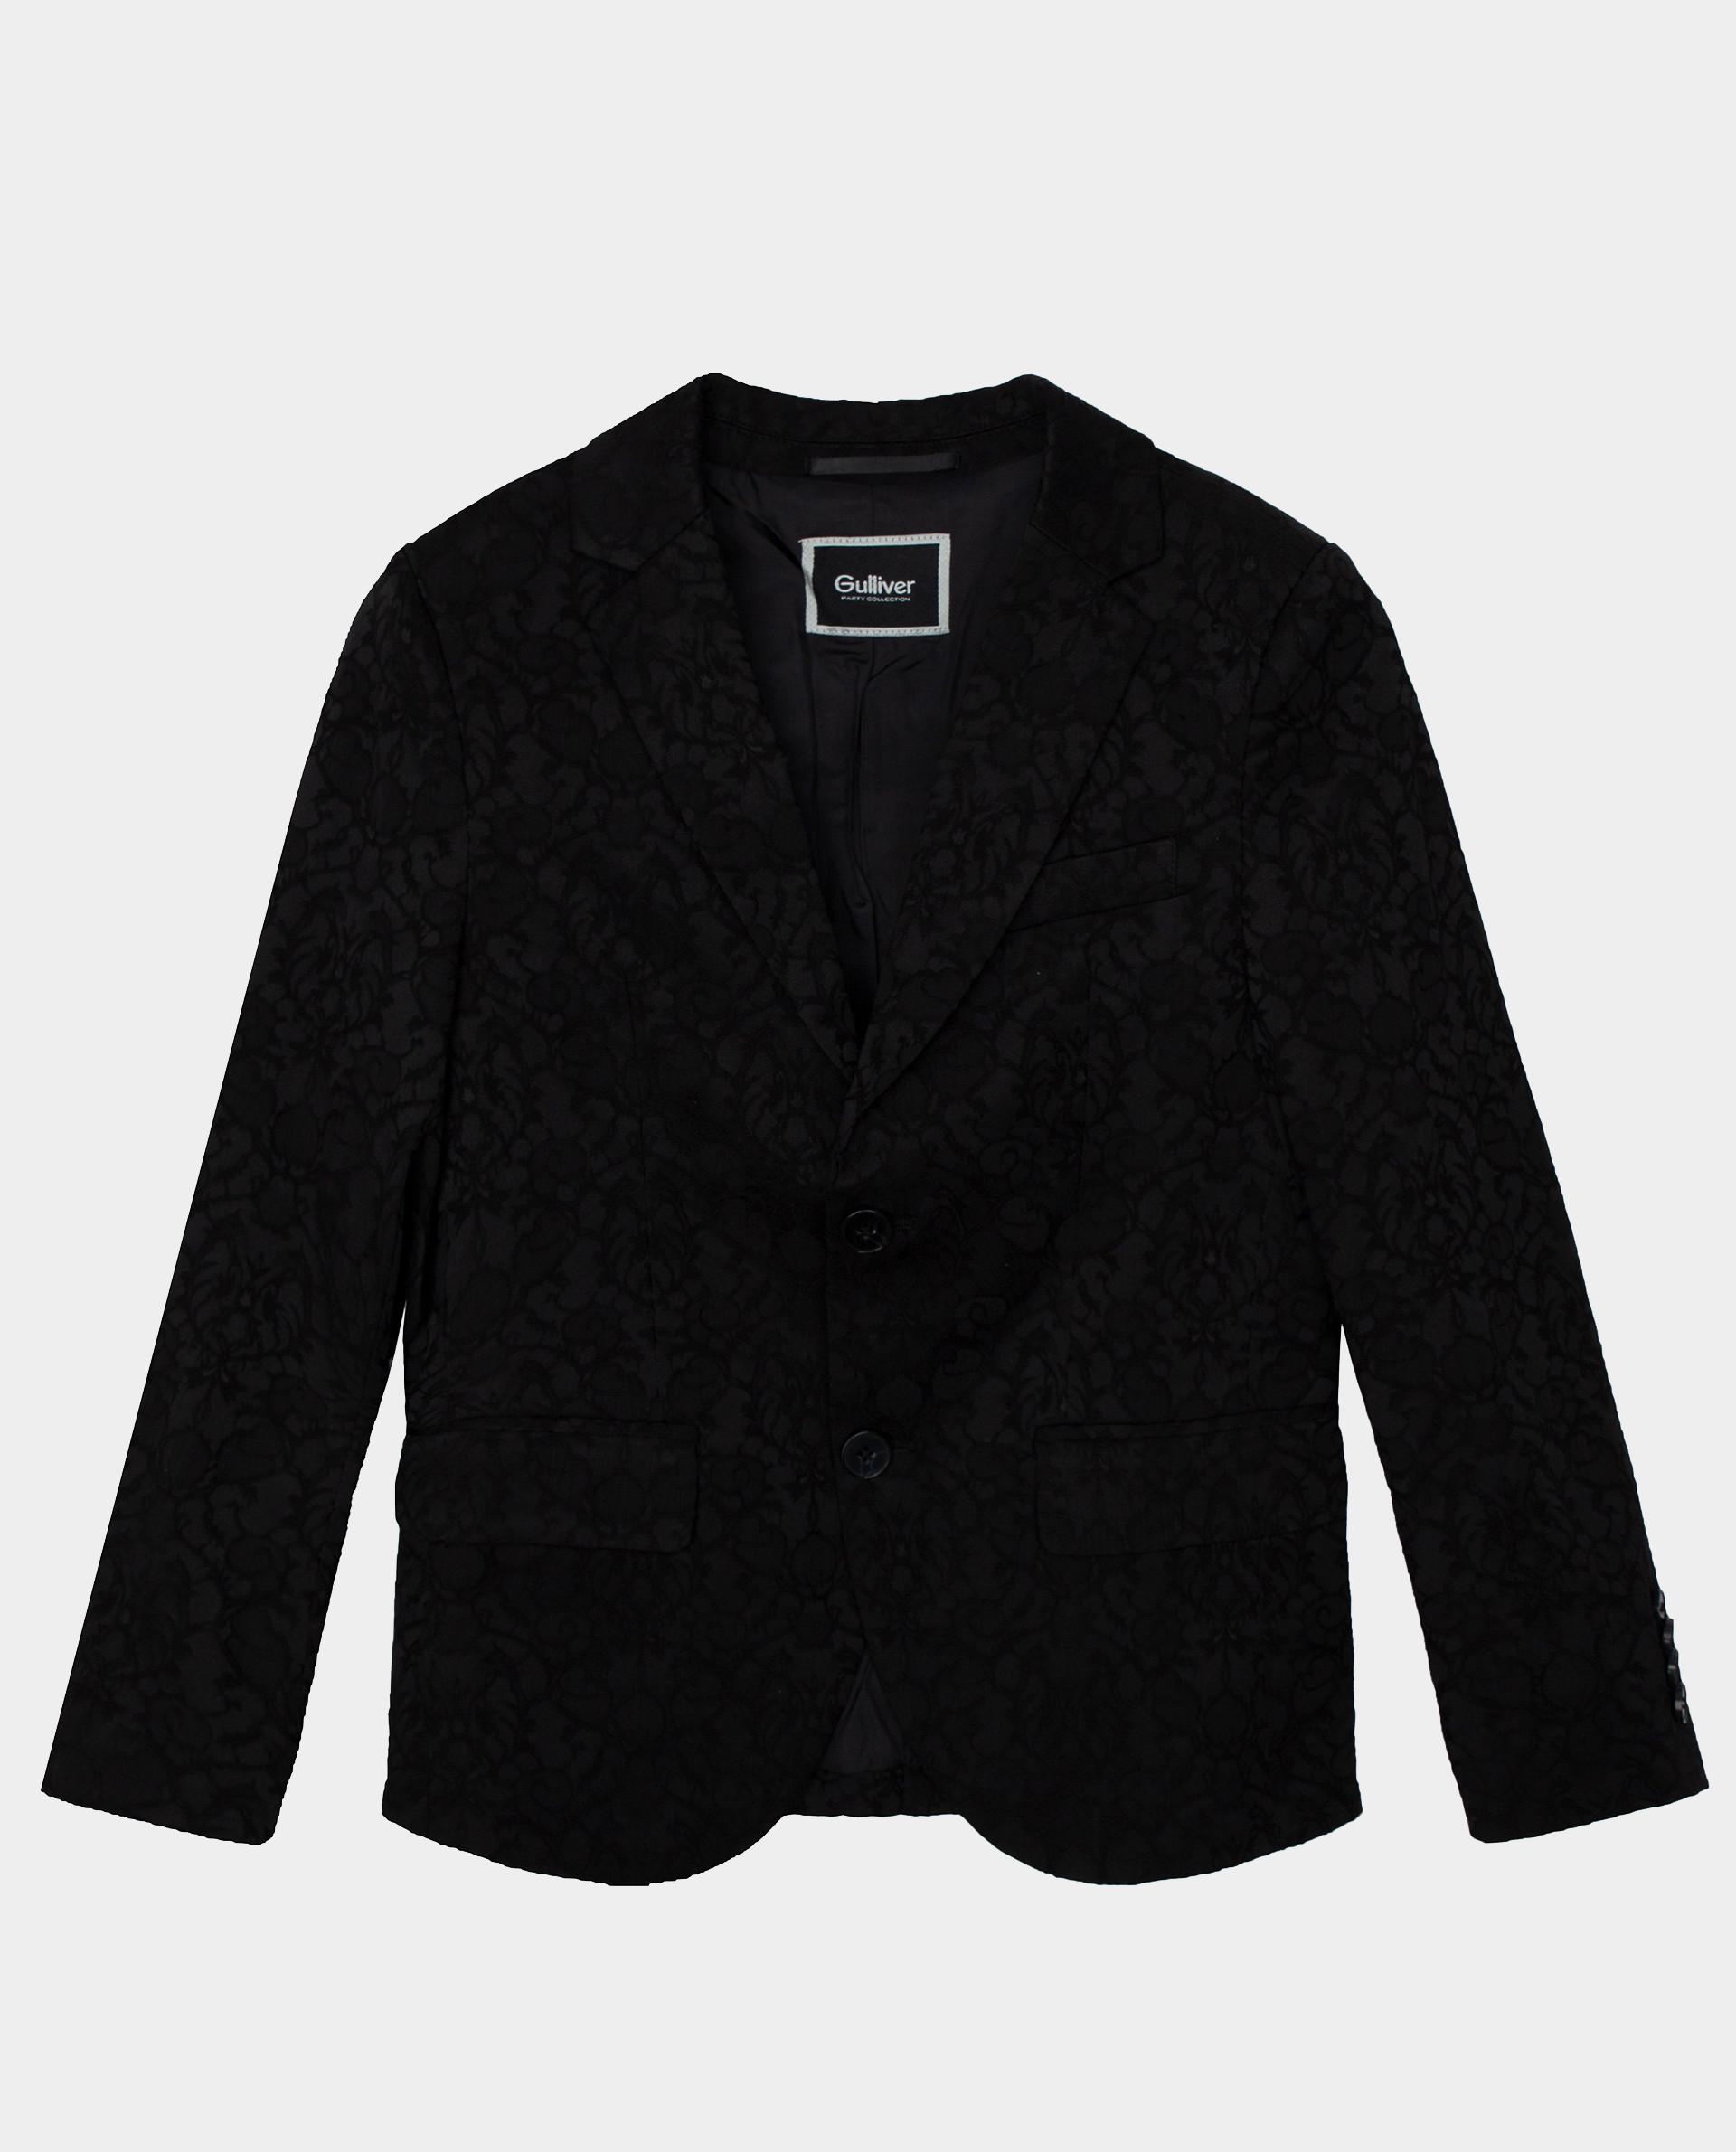 Черный пиджак Gulliver размер 158 220GPBJC4801